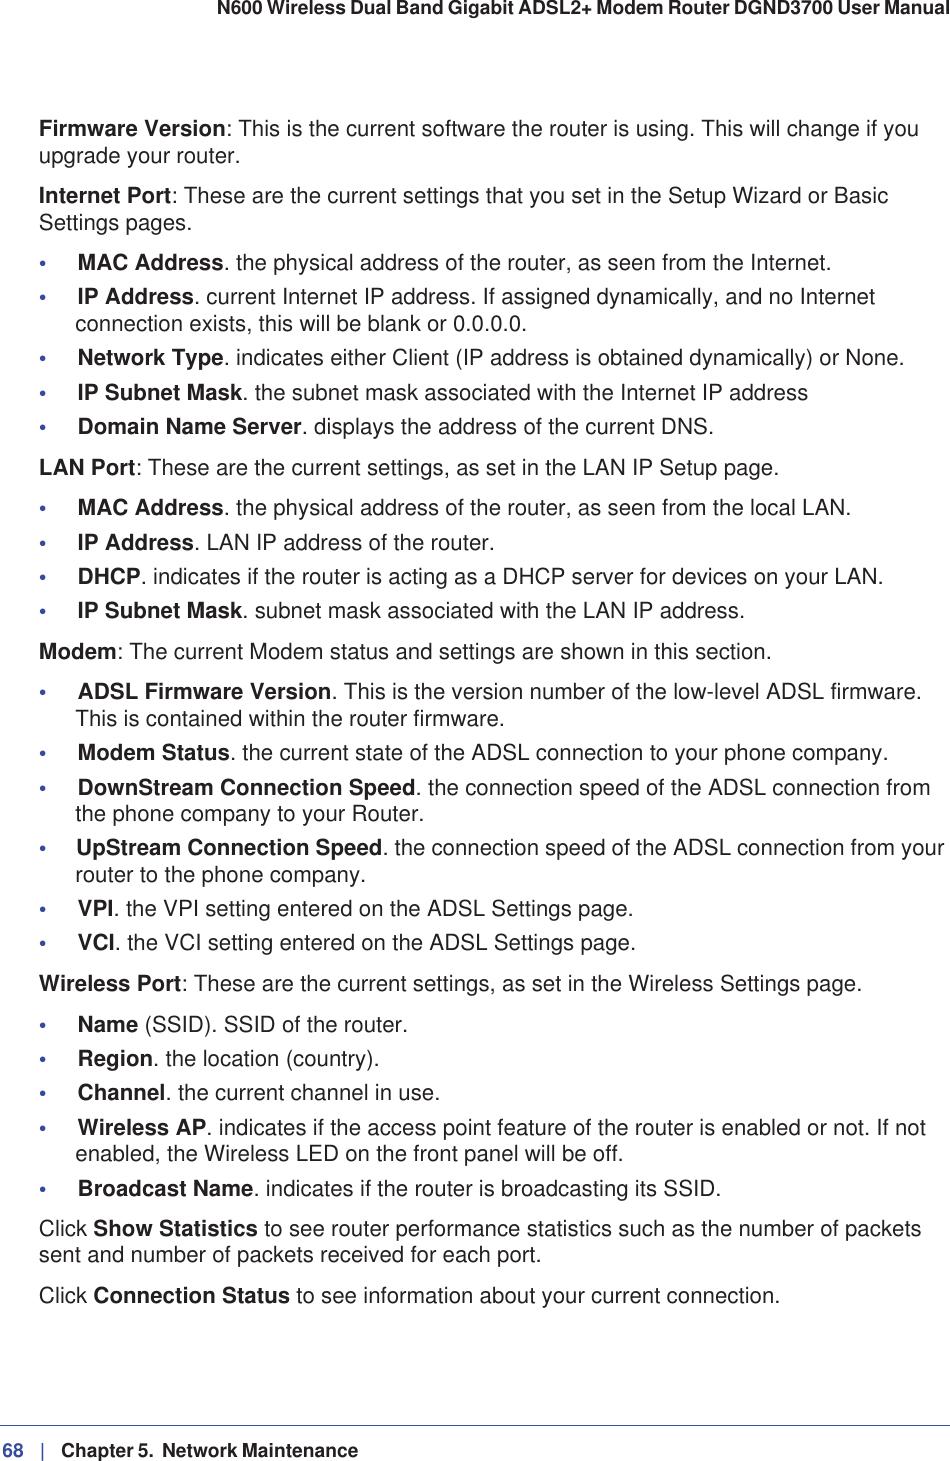 netgear n600 modem router manual